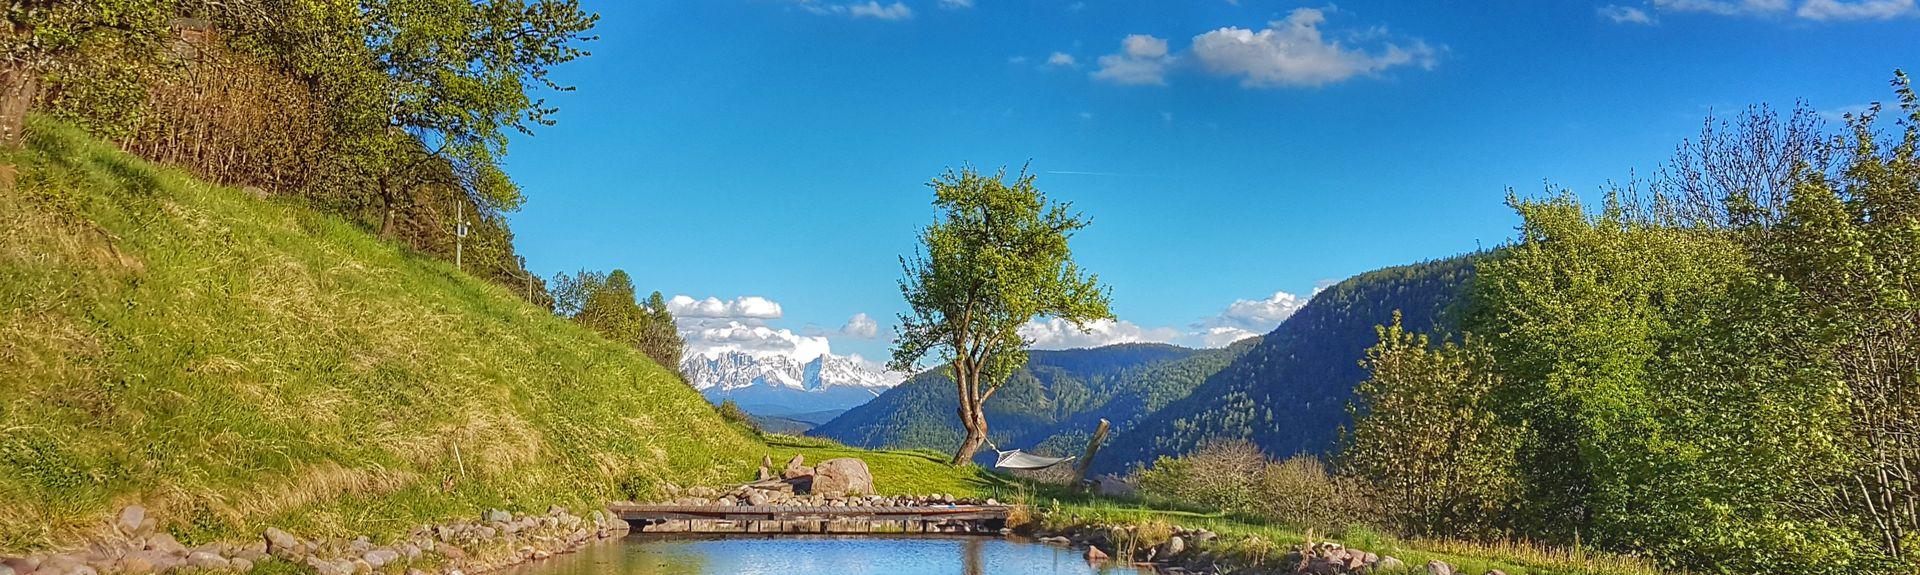 NATURNO NATURNS (Station), Naturno, Trentino-Alto Adige, Italy